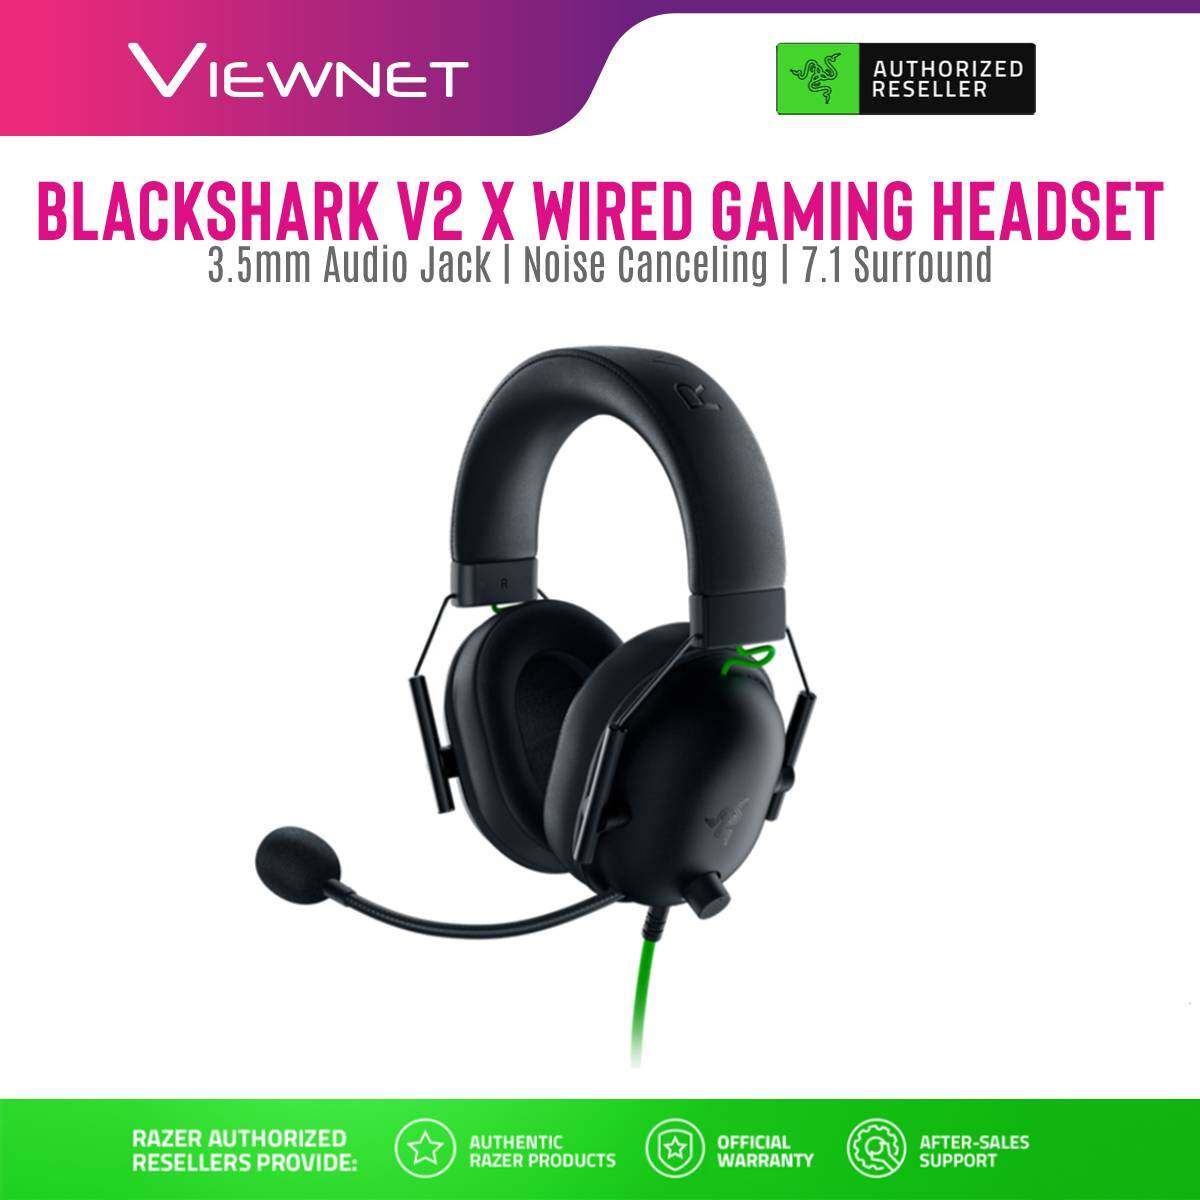 Razer Wired Gaming Headset BlackShark V2 X with 3.5mm Jack7.1 Surround Sound Passive Noise Cancellation Hyperclear Cardioid Mic Lightweight Comfort Design